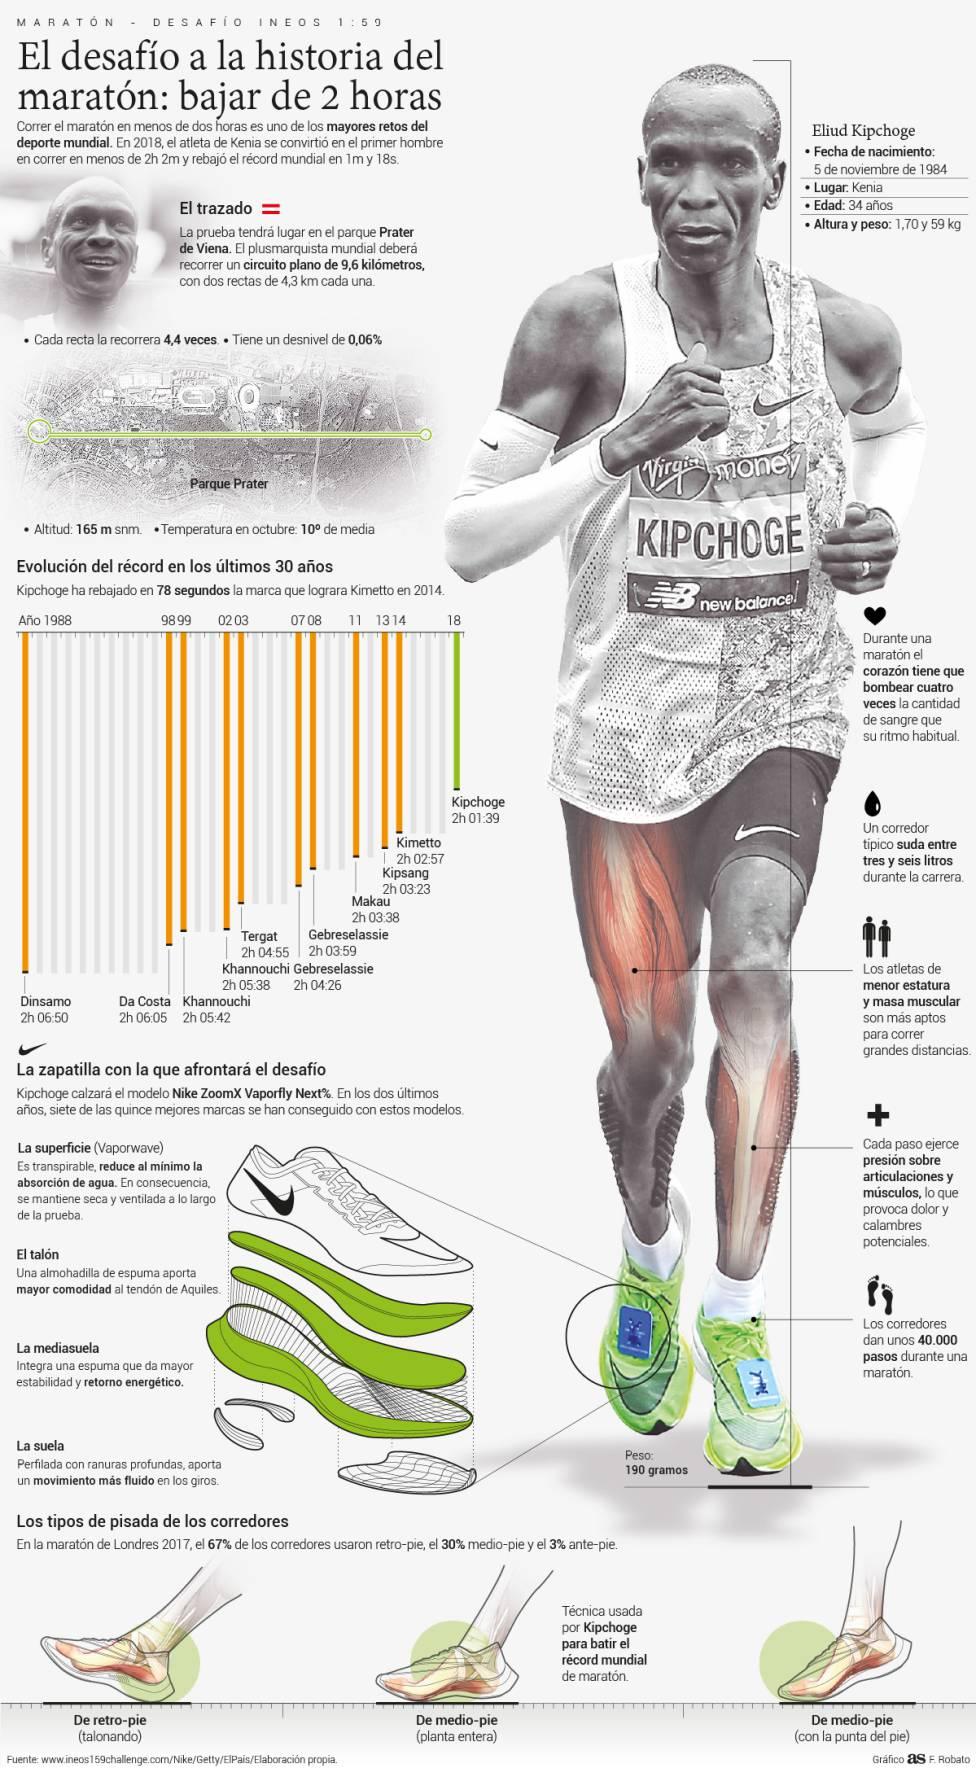 Nike ZoomX Vaporfly NEXT% el nuevo calzado de Eliud Kipchoge